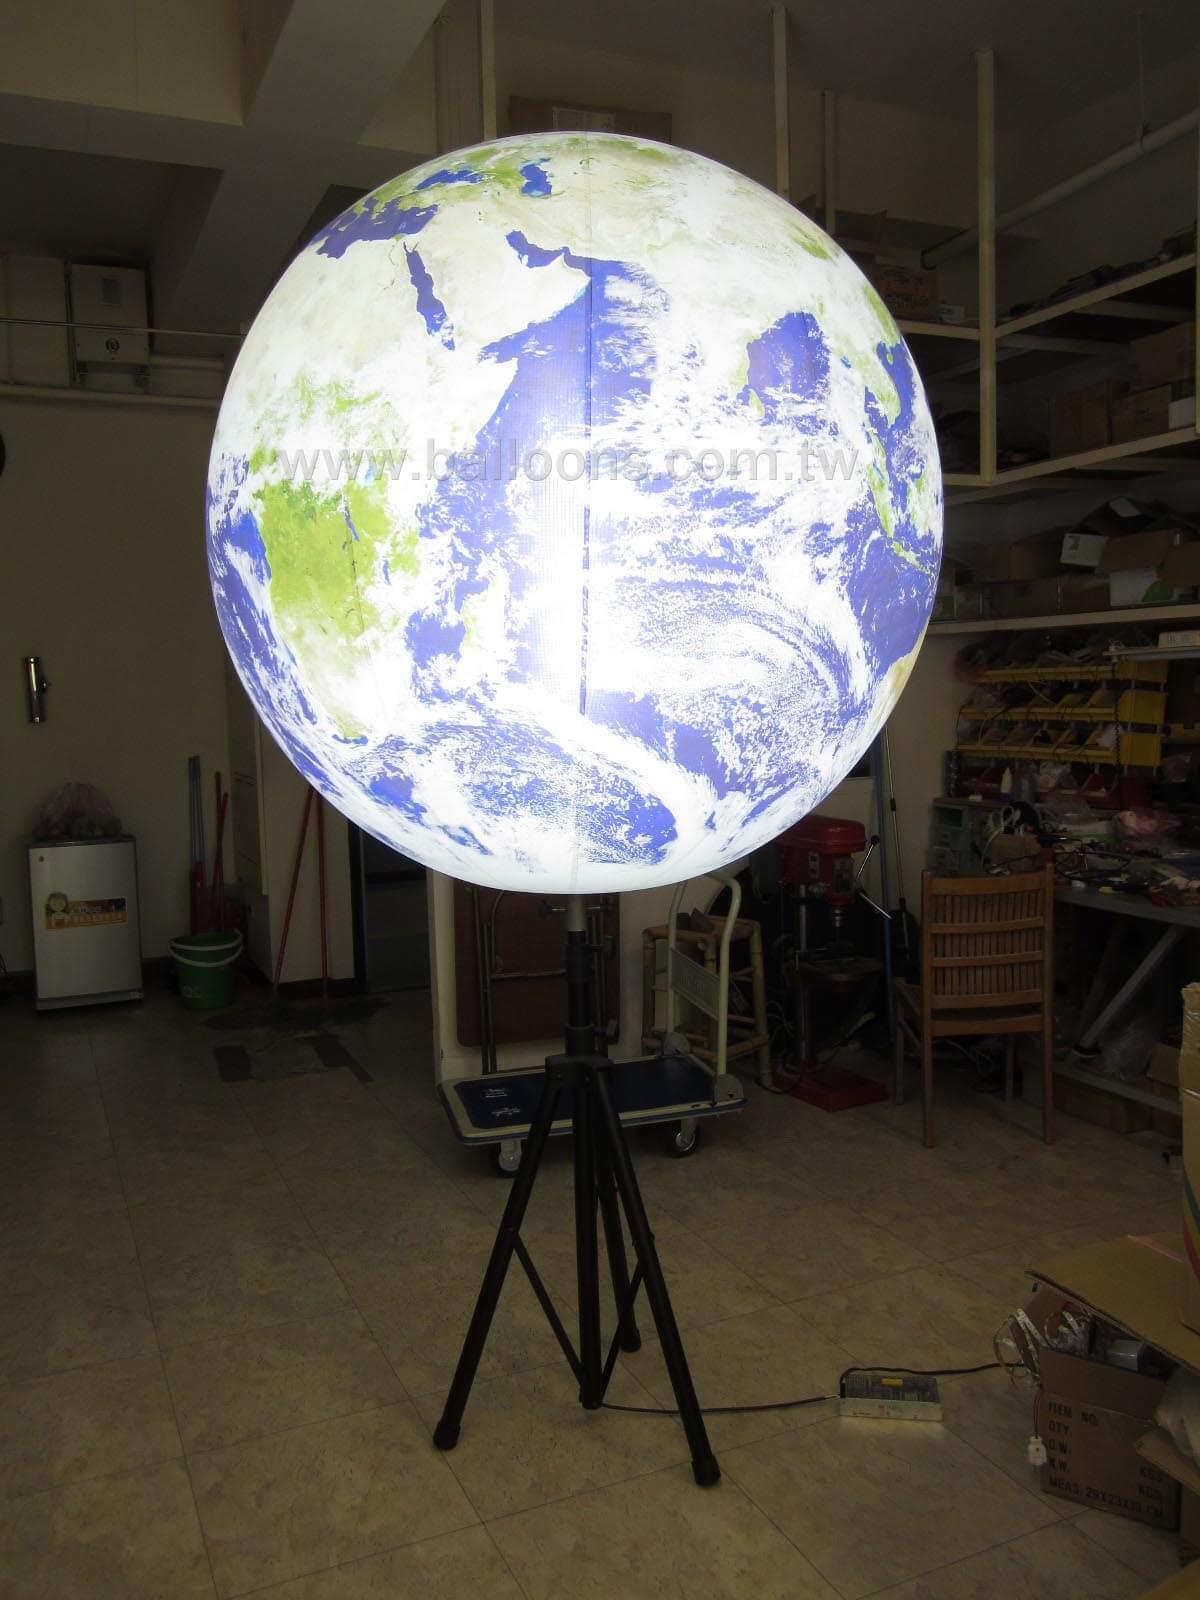 LED lighted stand and globe balloon站立式LED三腳燈架搭配地球圖案氣球